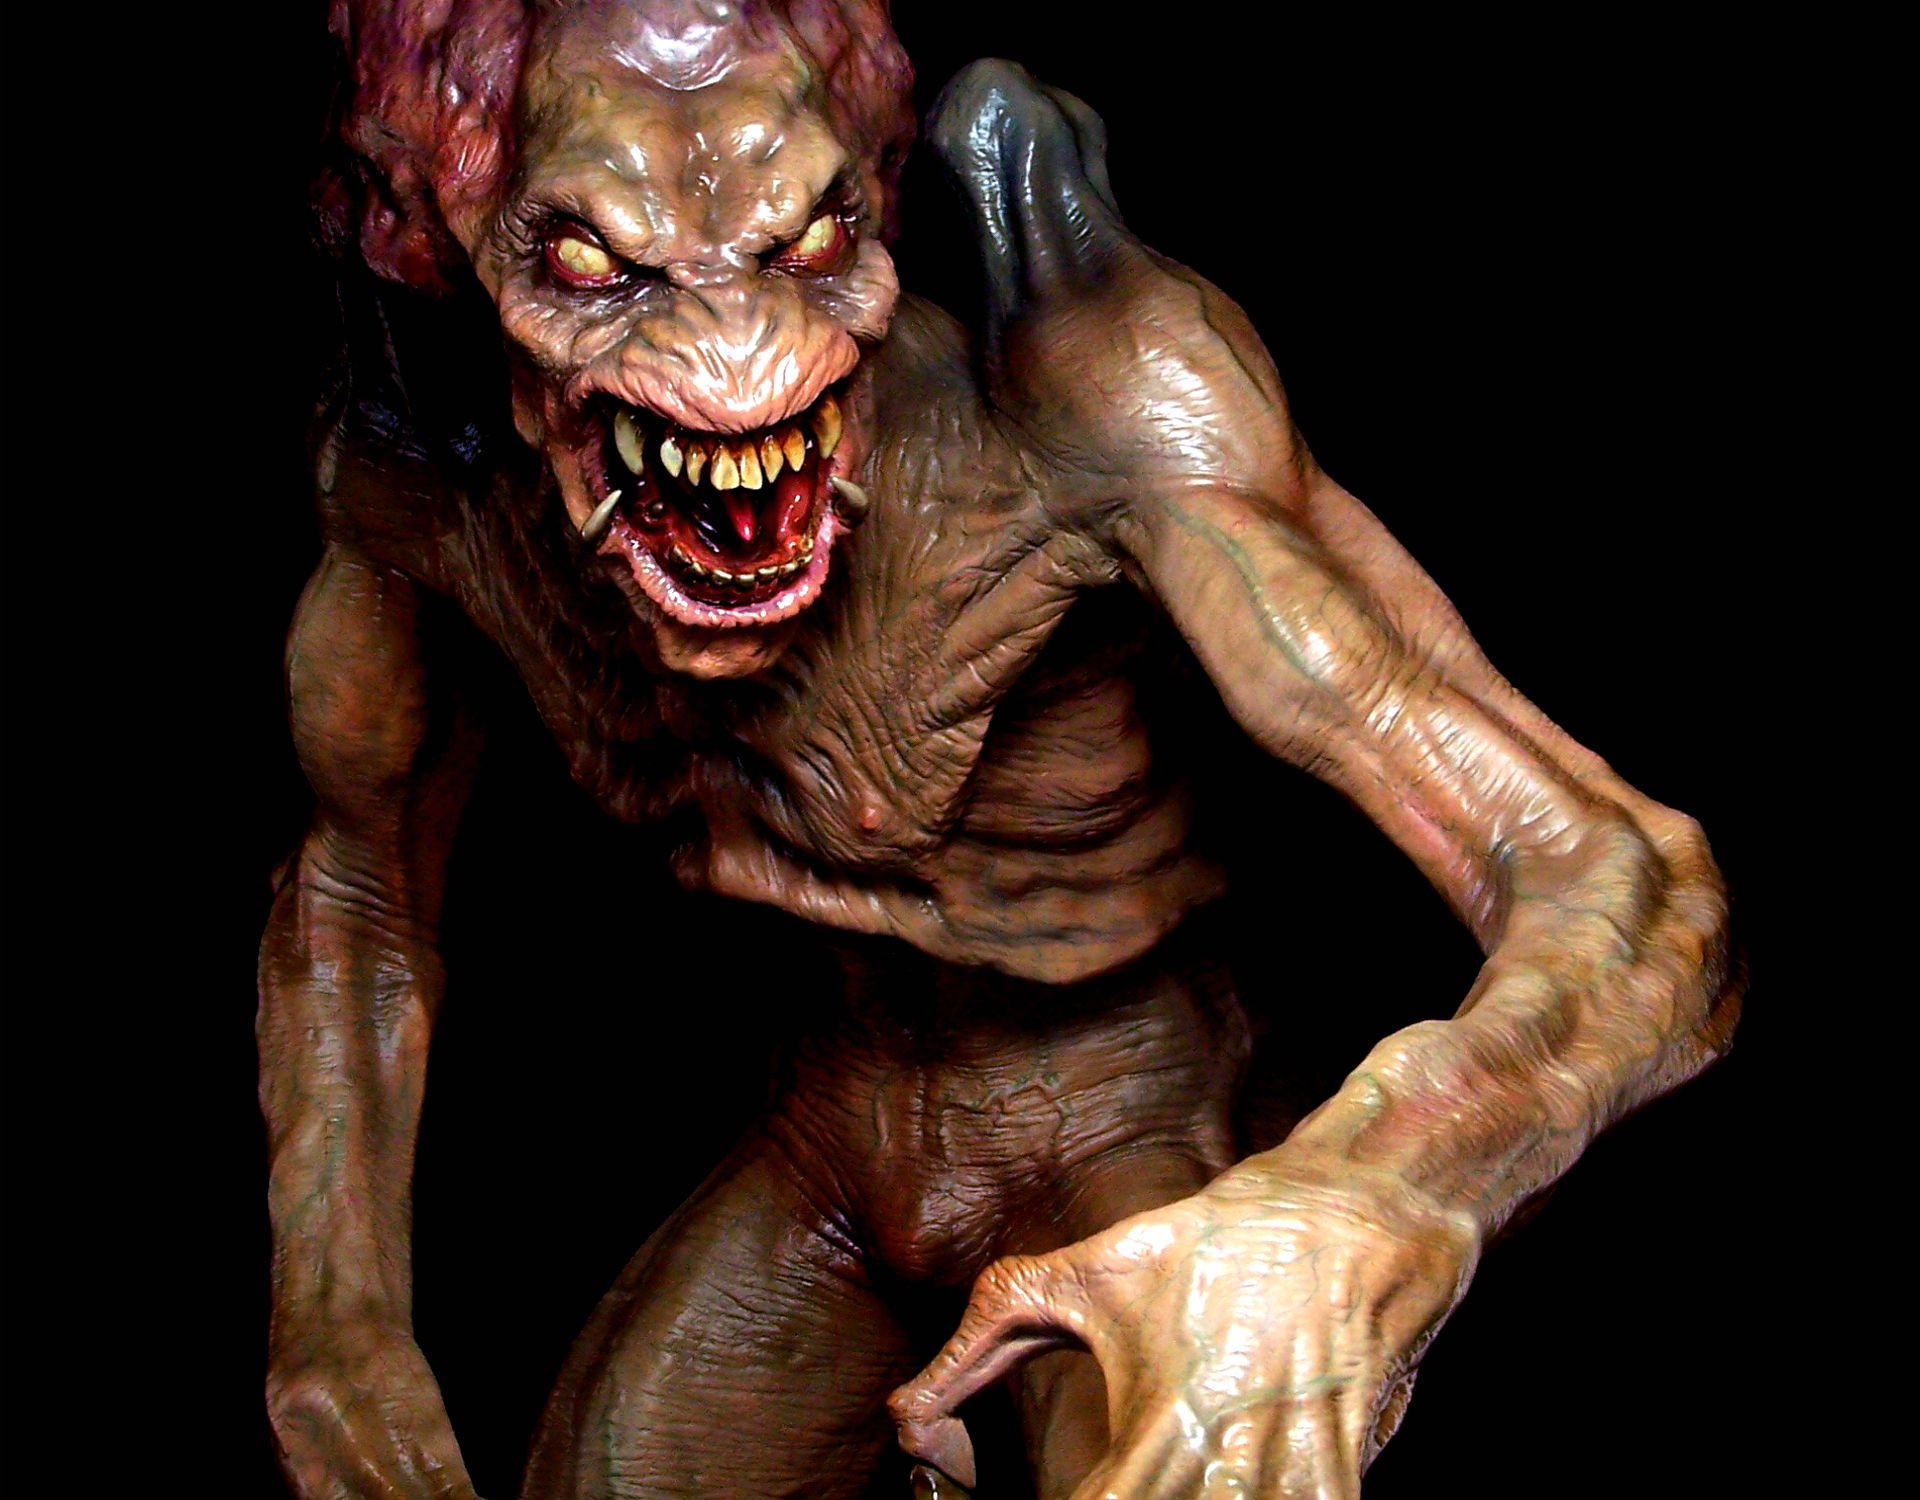 pumpkinhead horror movie film dark monster halloween